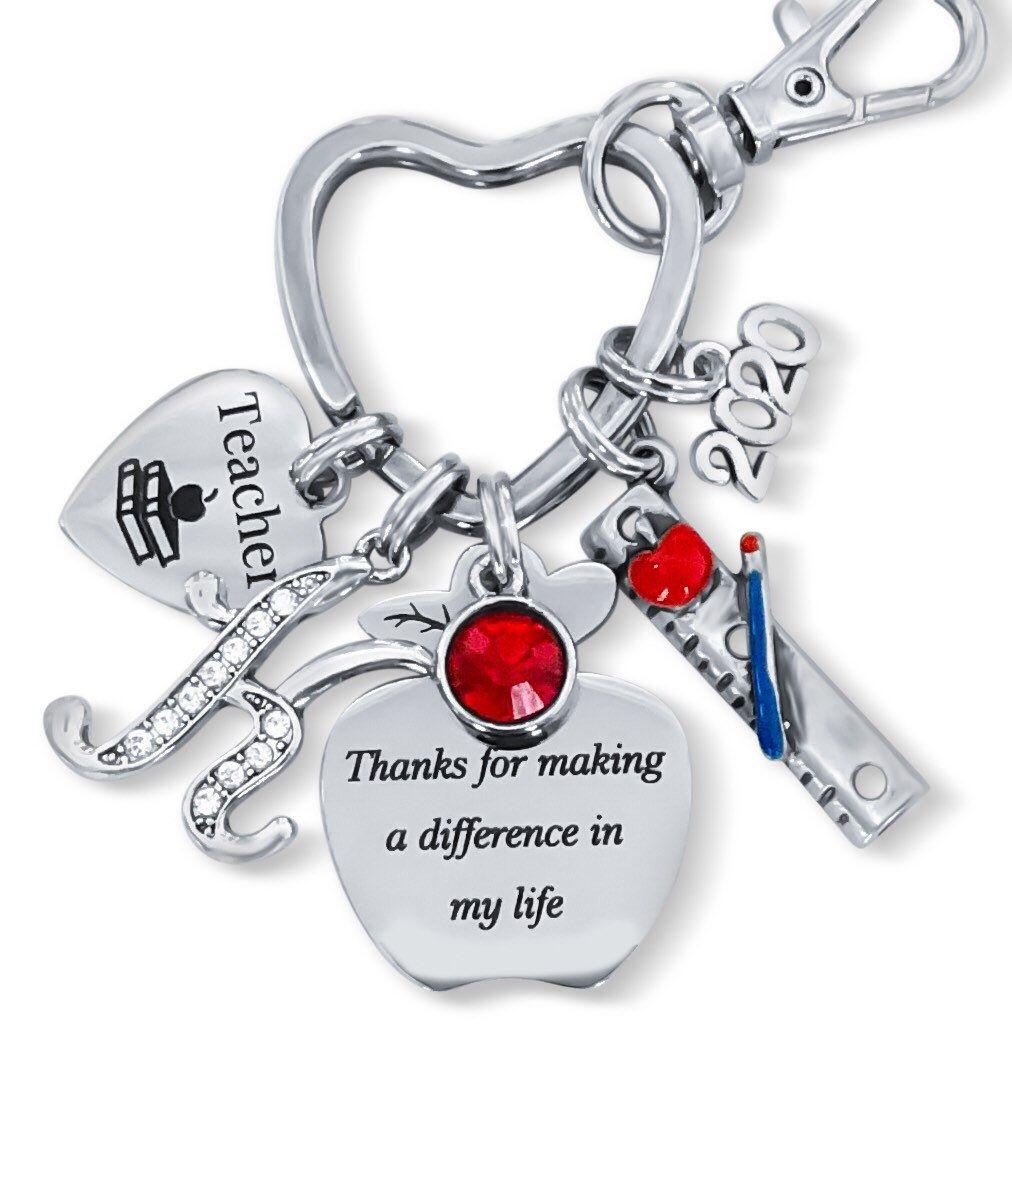 Teacher Gift Ideas Personalized Teacher Gifts Teacher Christmas Gift TEACHER GIFTS Teacher Keychain Gift For Teacher Unique Teacher Gift